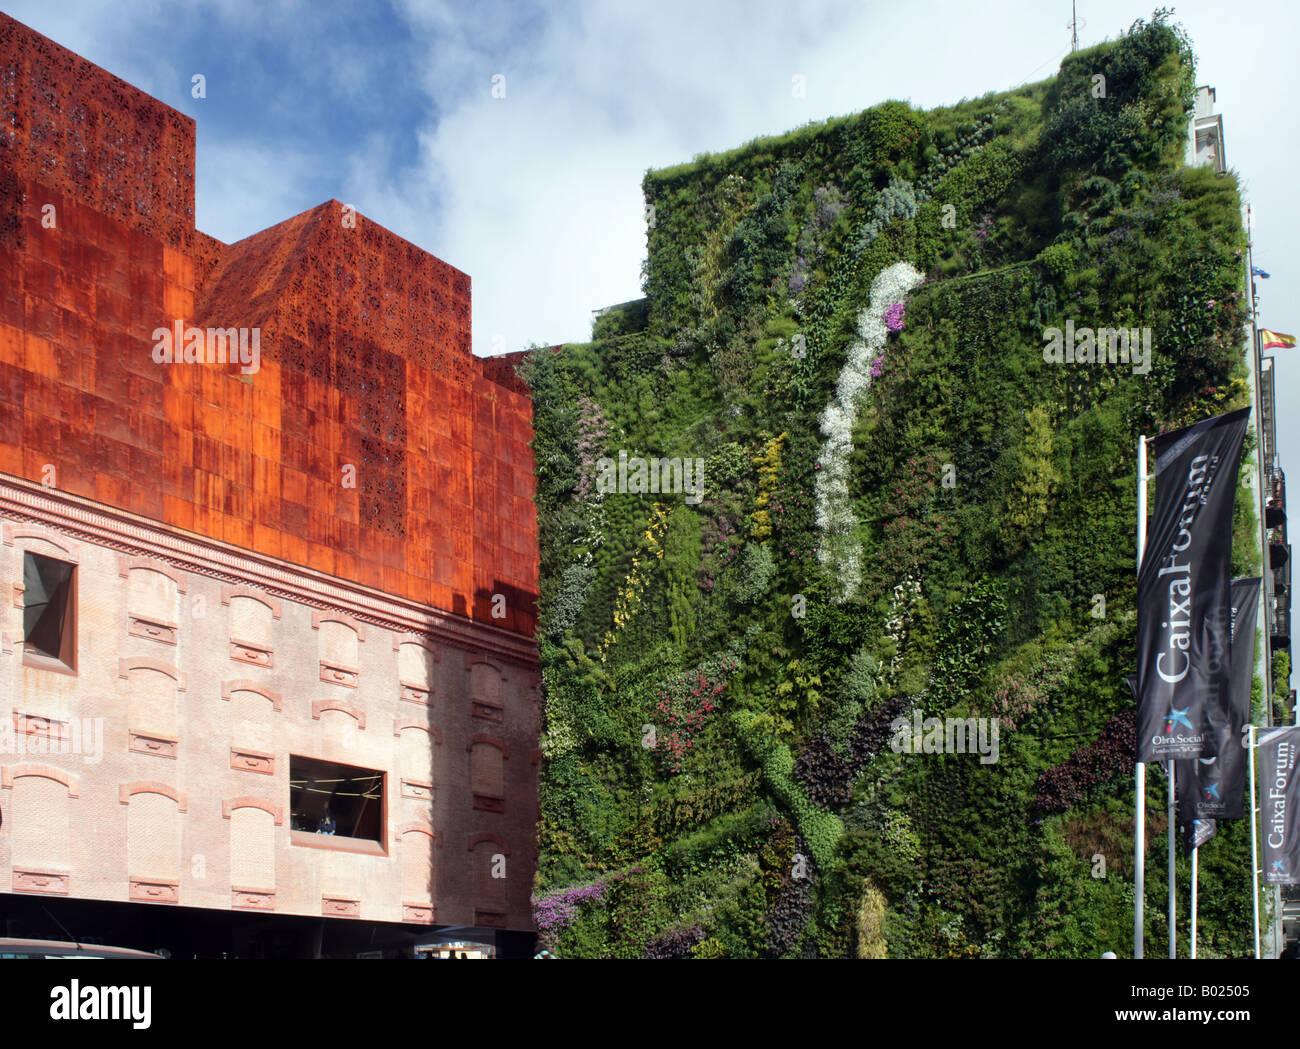 Caixa Forum Museum And Vertical Garden Madrid